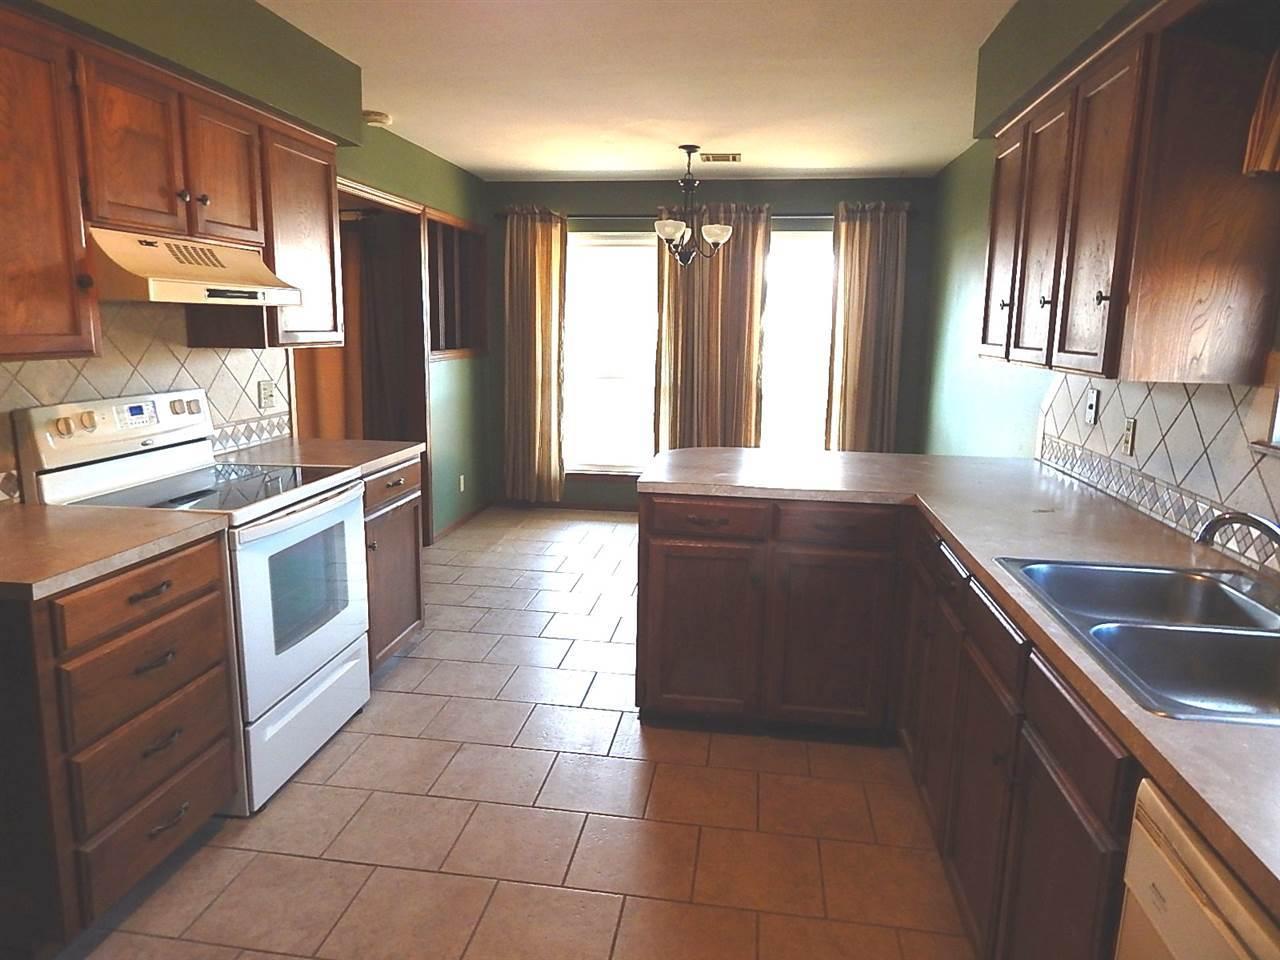 Sold Cross Sale W/ MLS | 2312 Calvert Ponca City, OK 74601 7